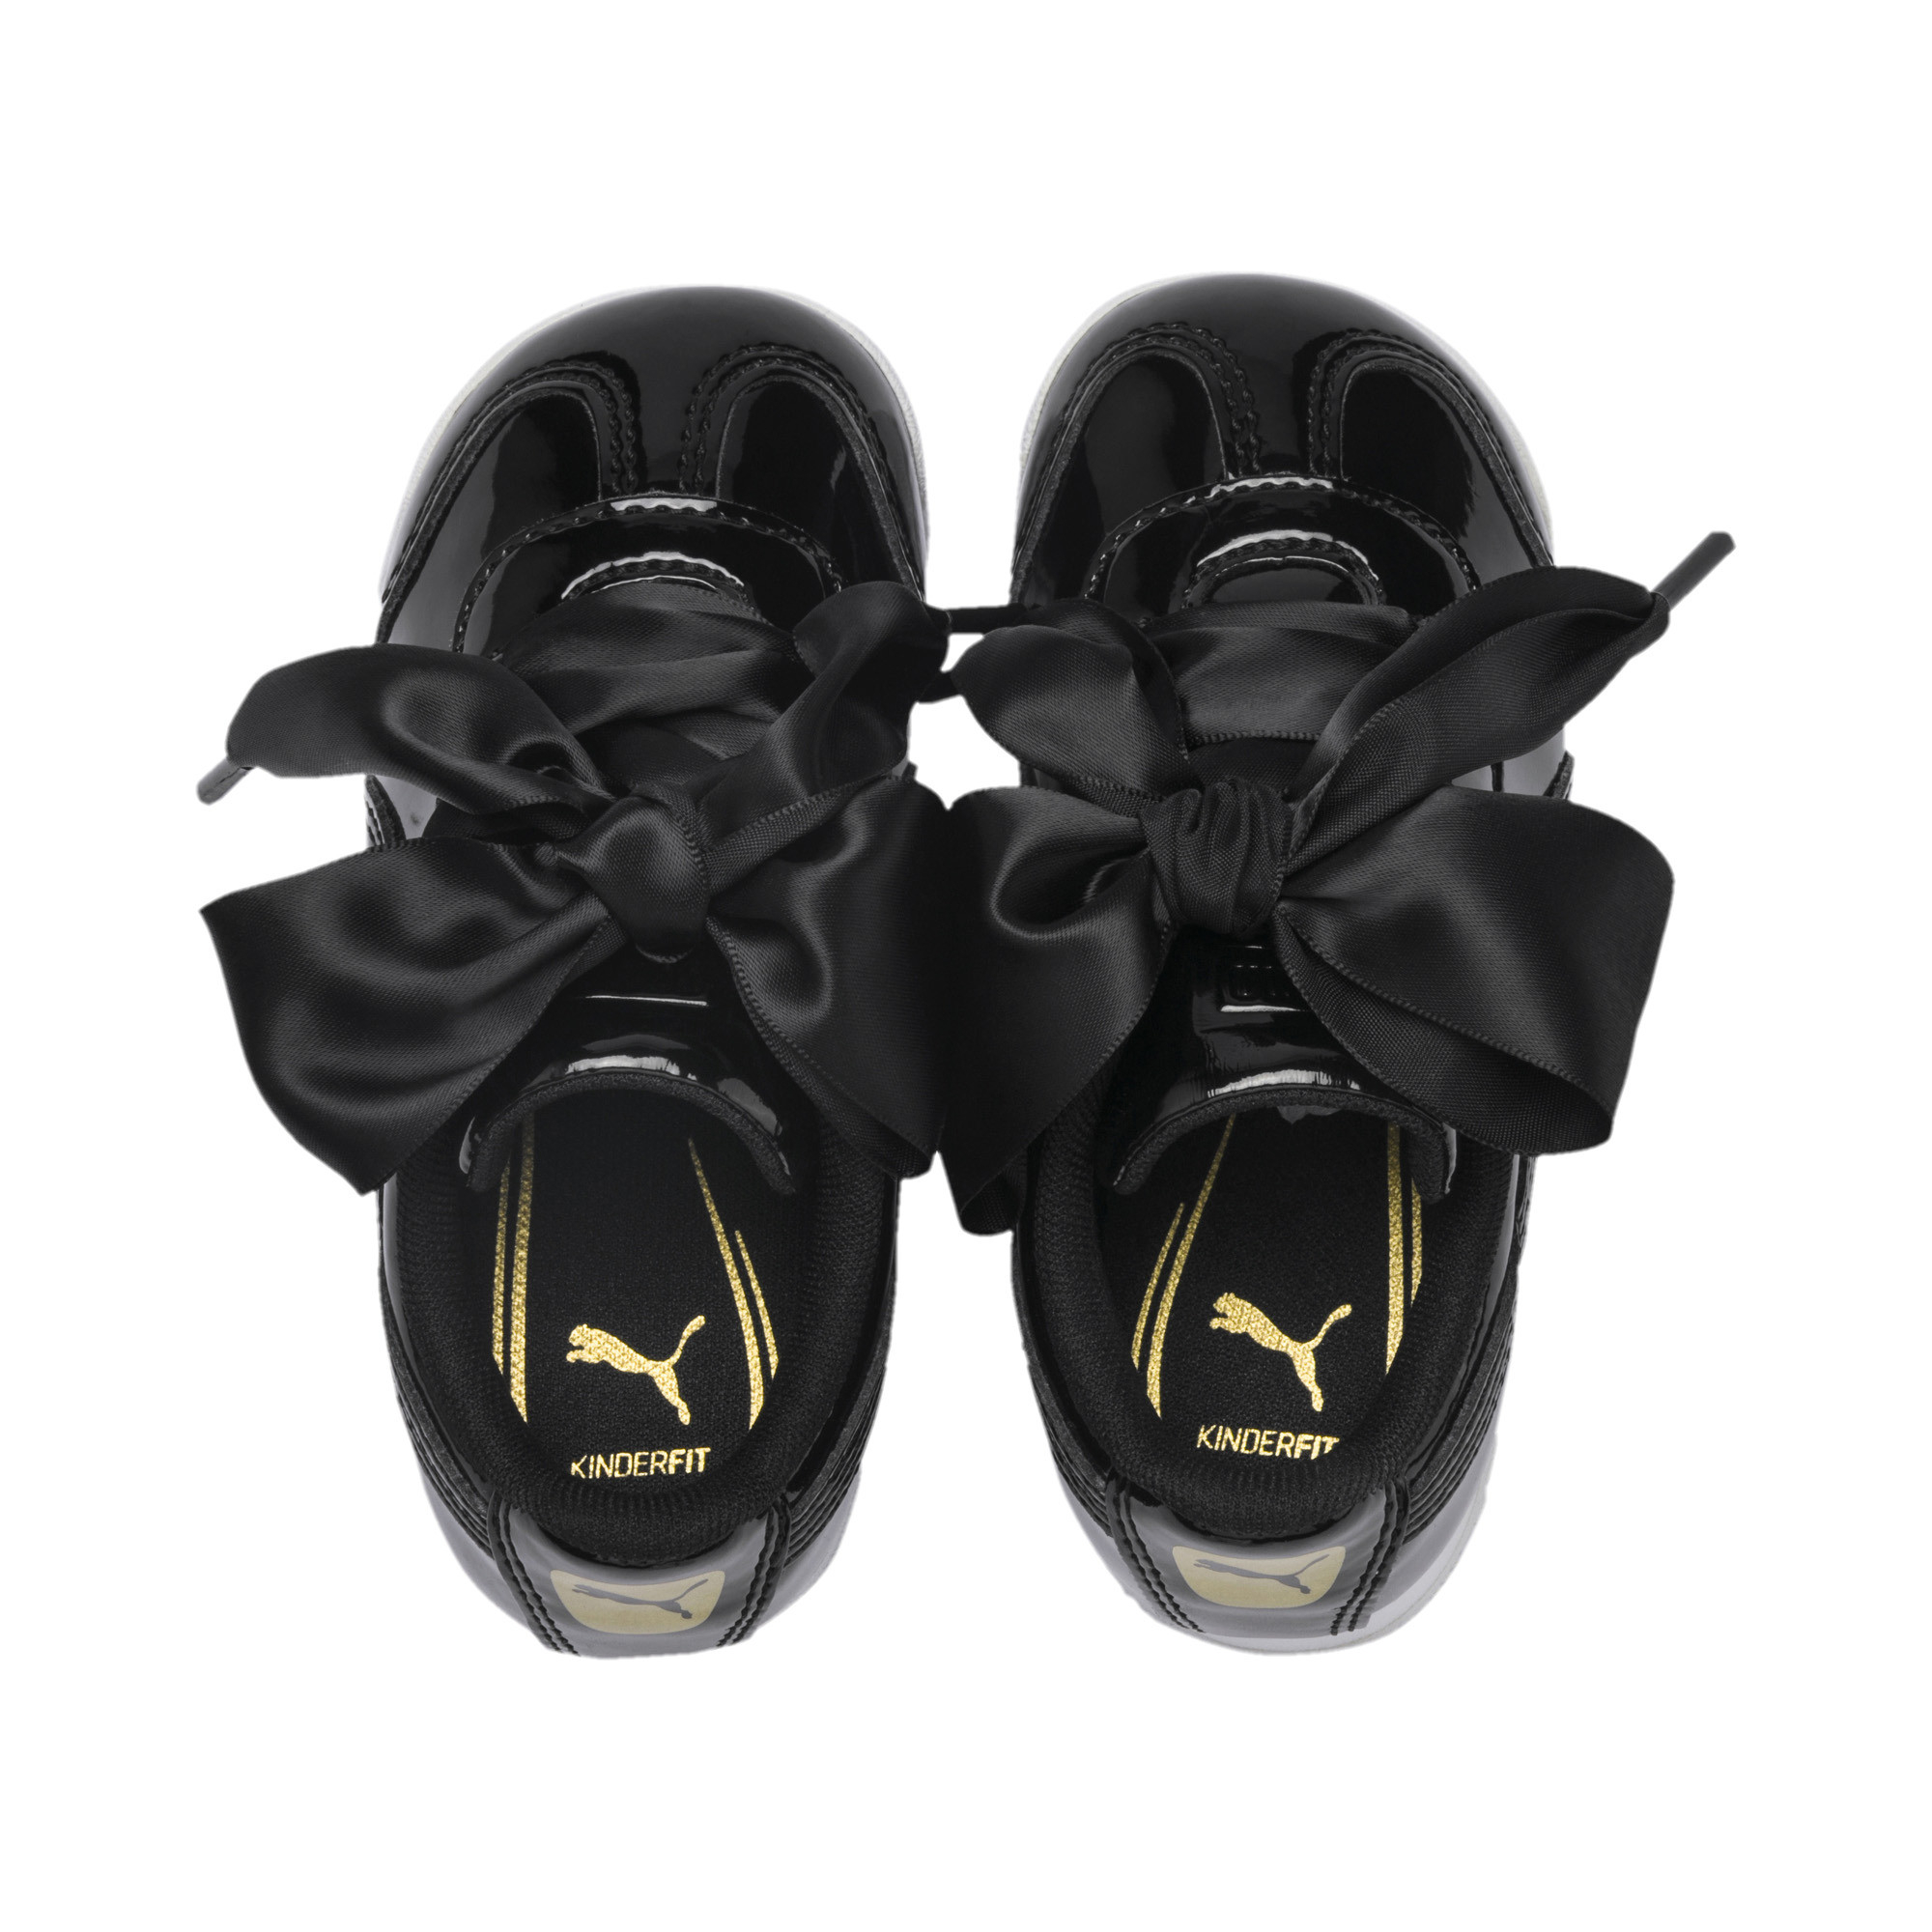 PUMA-Roma-Heart-Patent-Toddler-Shoes-Girls-Shoe-Kids thumbnail 7